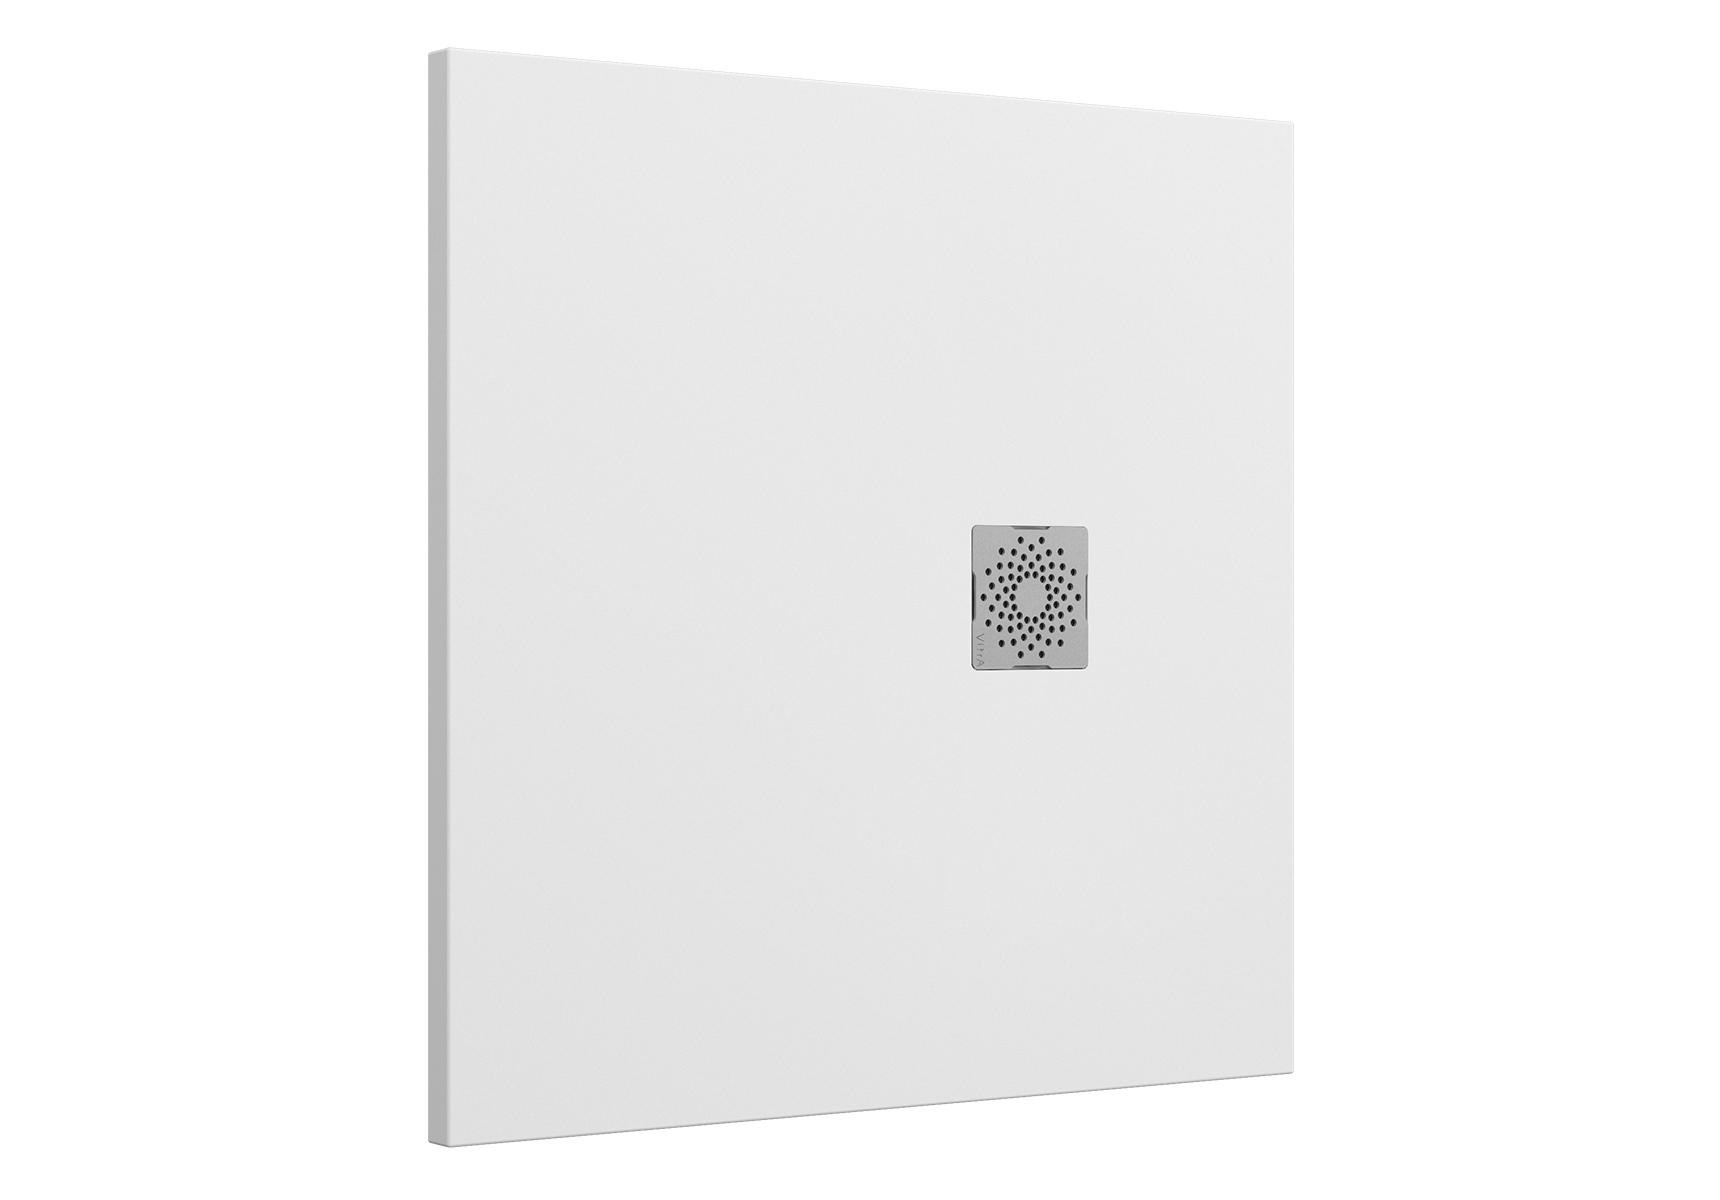 V-Stone Duschwanne, 90 x 90 cm, Weiß